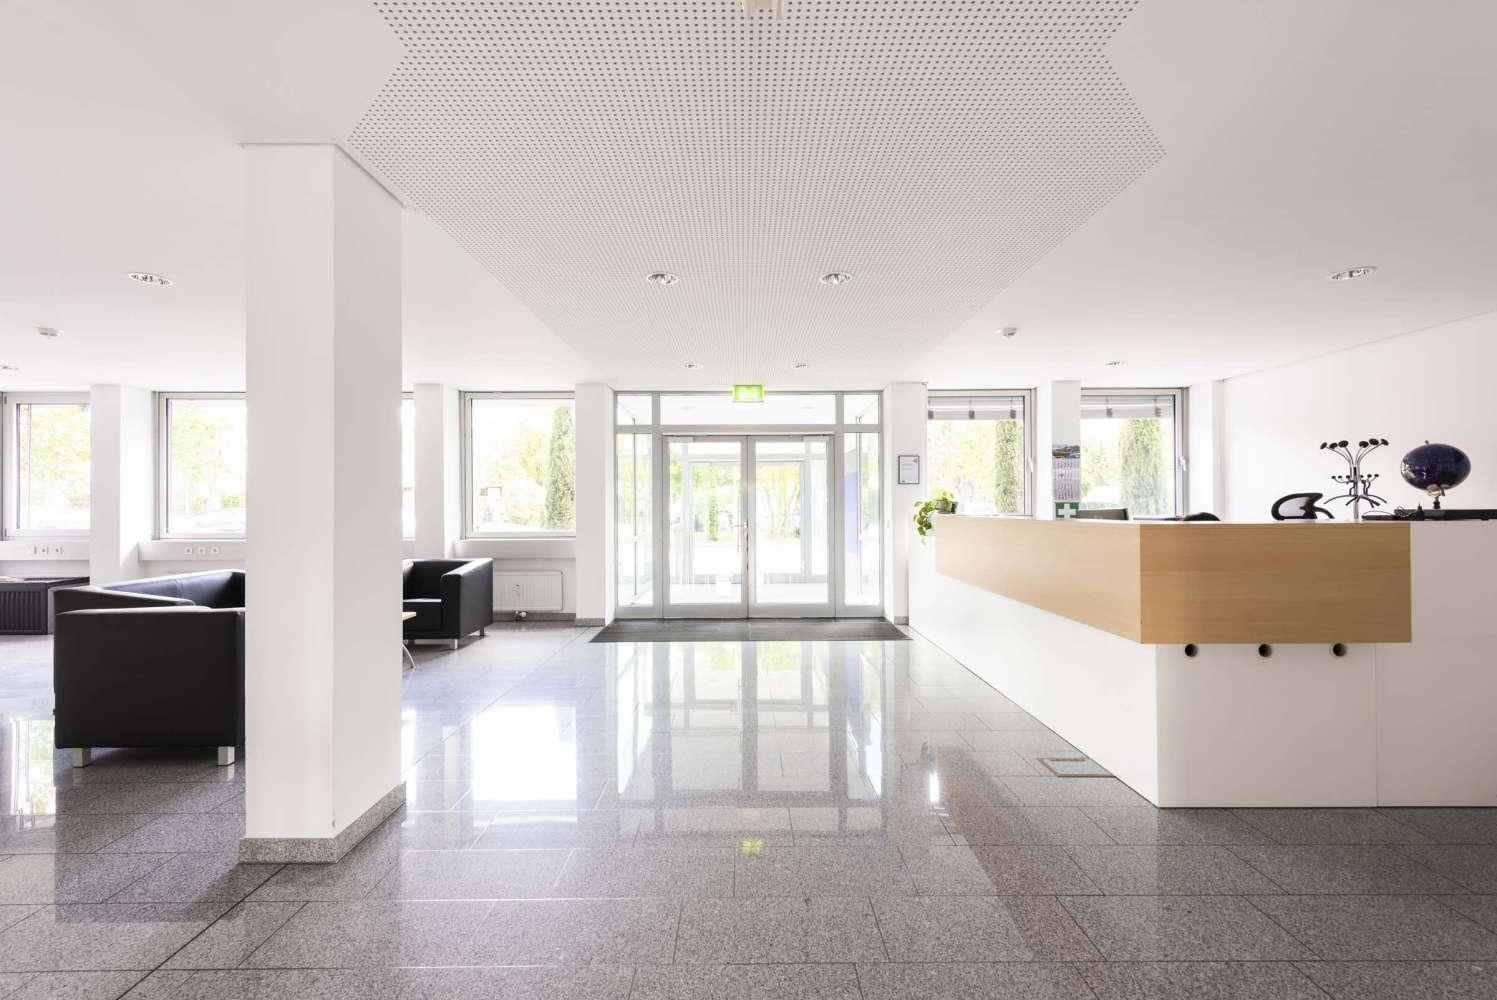 Büros Alsbach-hähnlein, 64665 - Büro - Alsbach-Hähnlein, Sandwiese - F2665 - 10533982